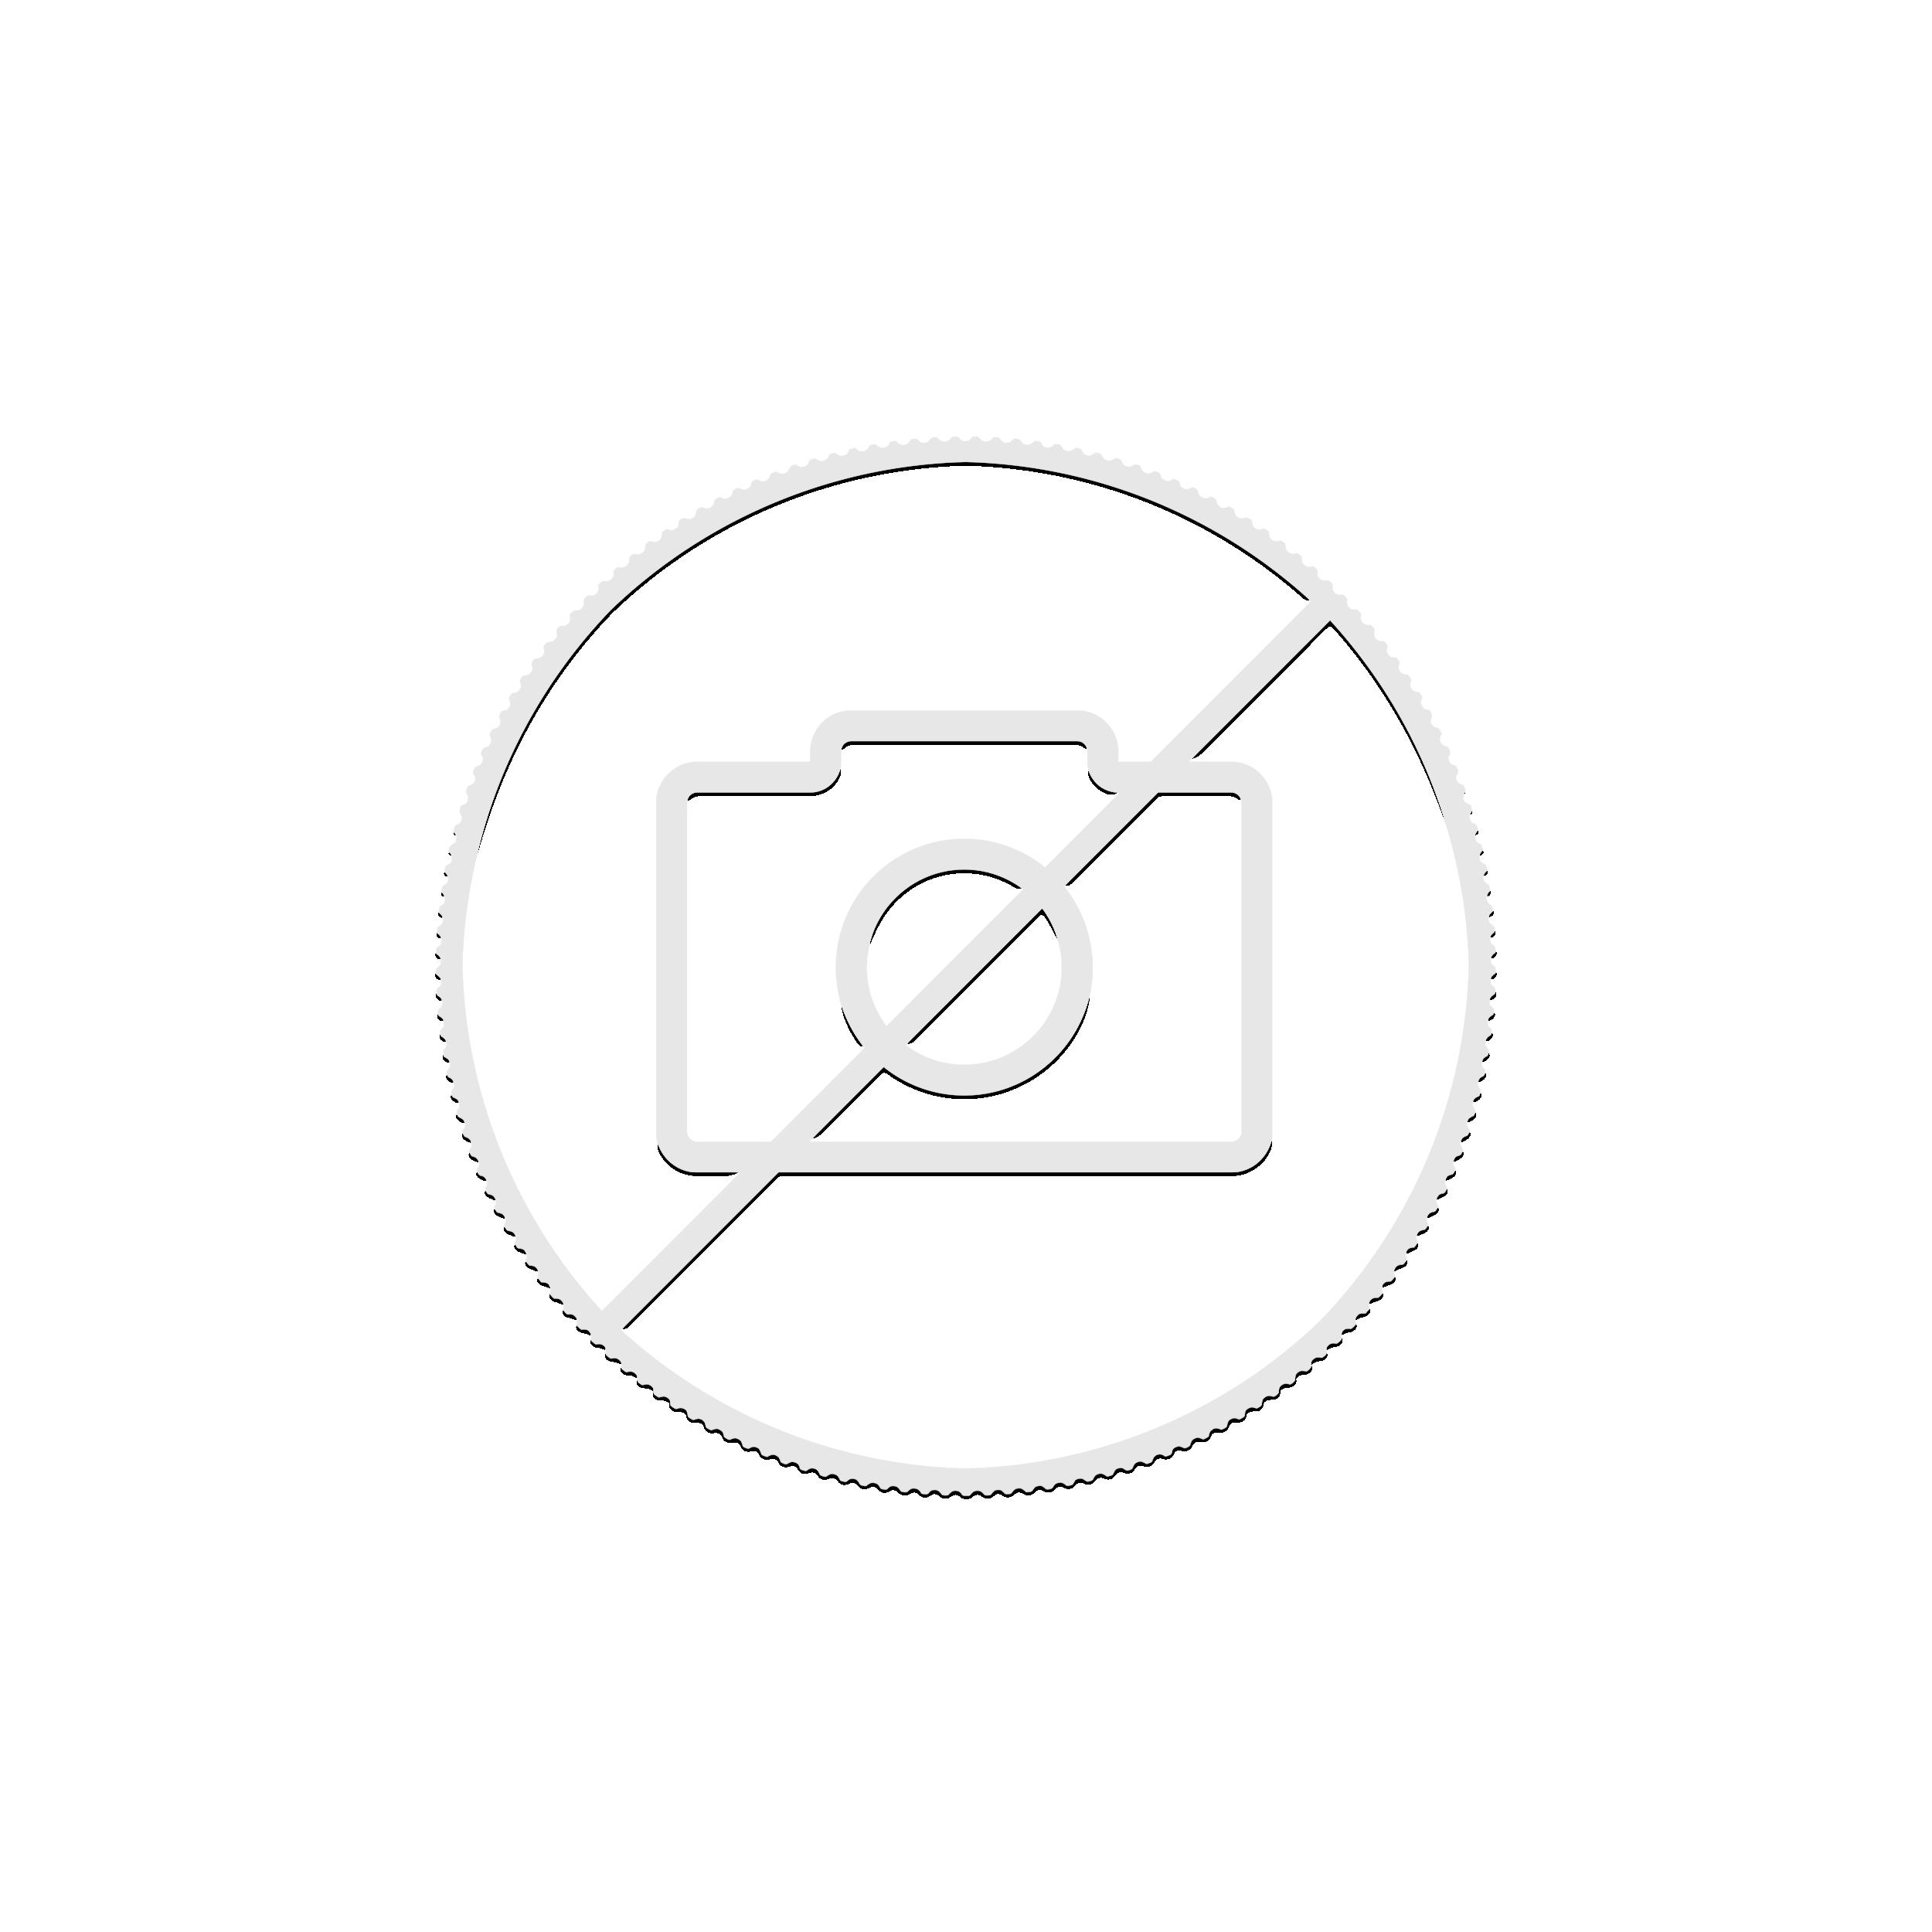 3 troy ounce zilveren munt Amun-Ra - ingezoomd